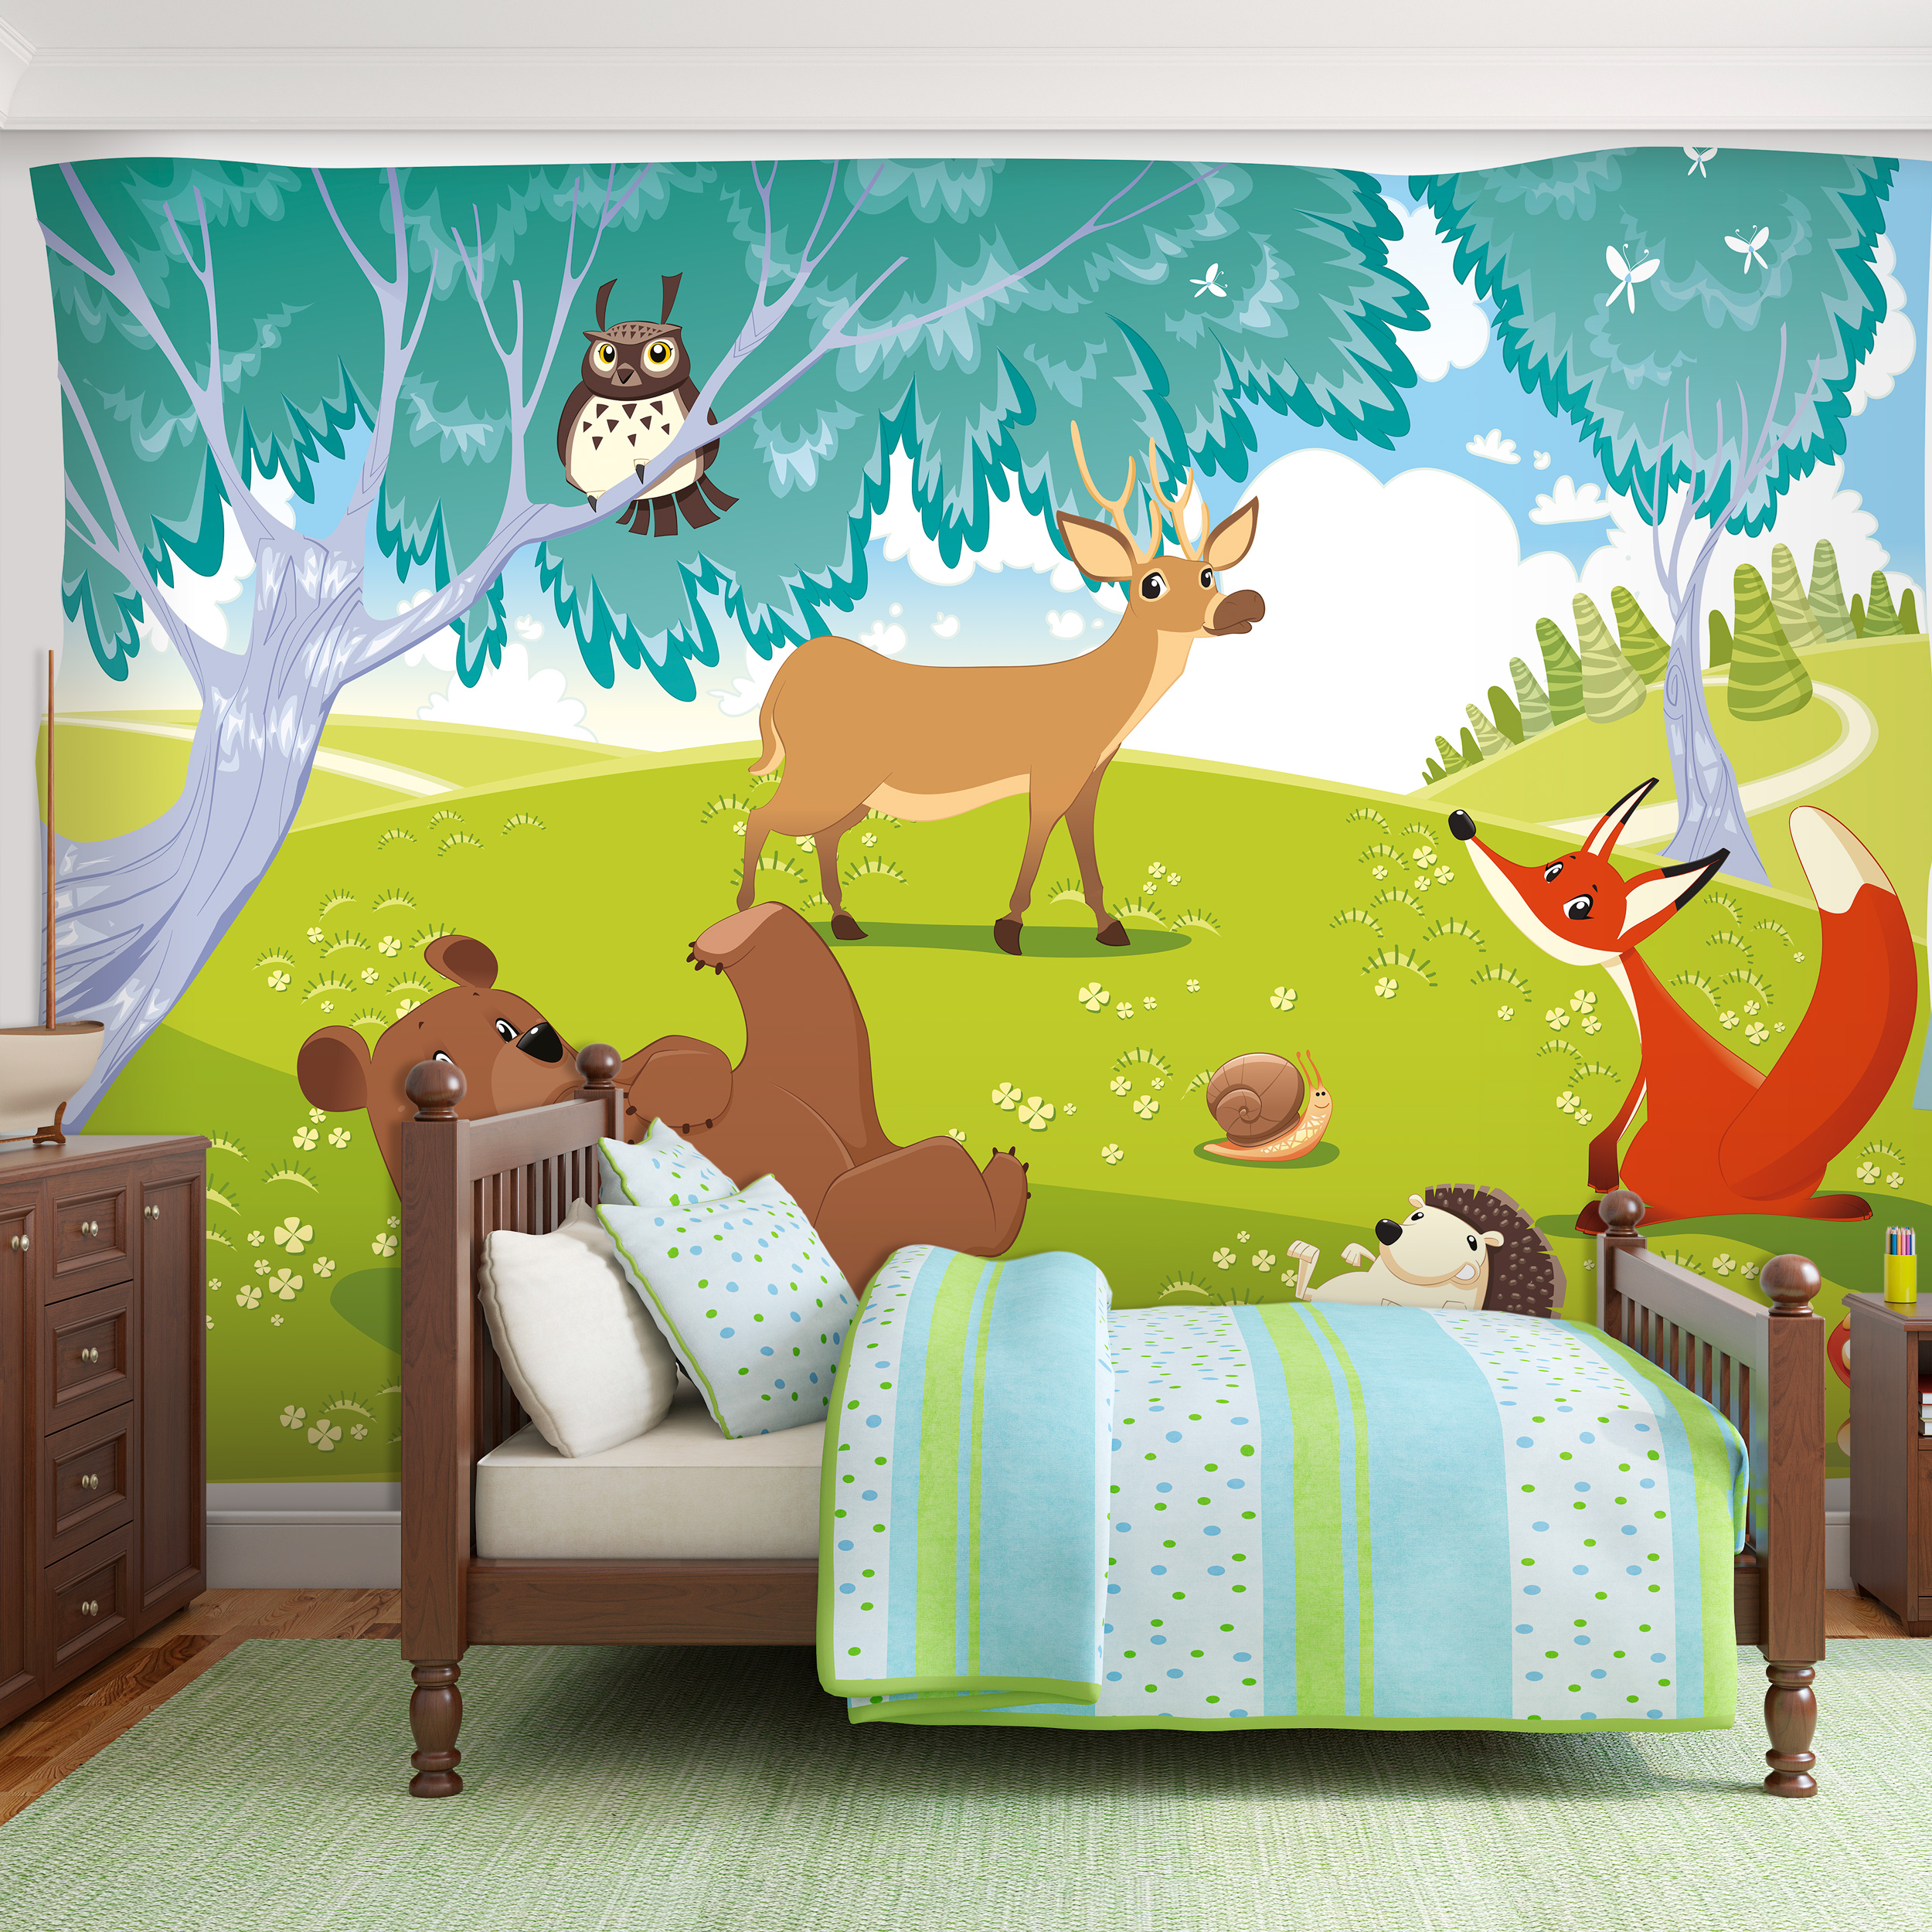 vlies fototapete tiere bear fuchs wald tapete kinderzimmer wandbilder xxl 039 ebay. Black Bedroom Furniture Sets. Home Design Ideas